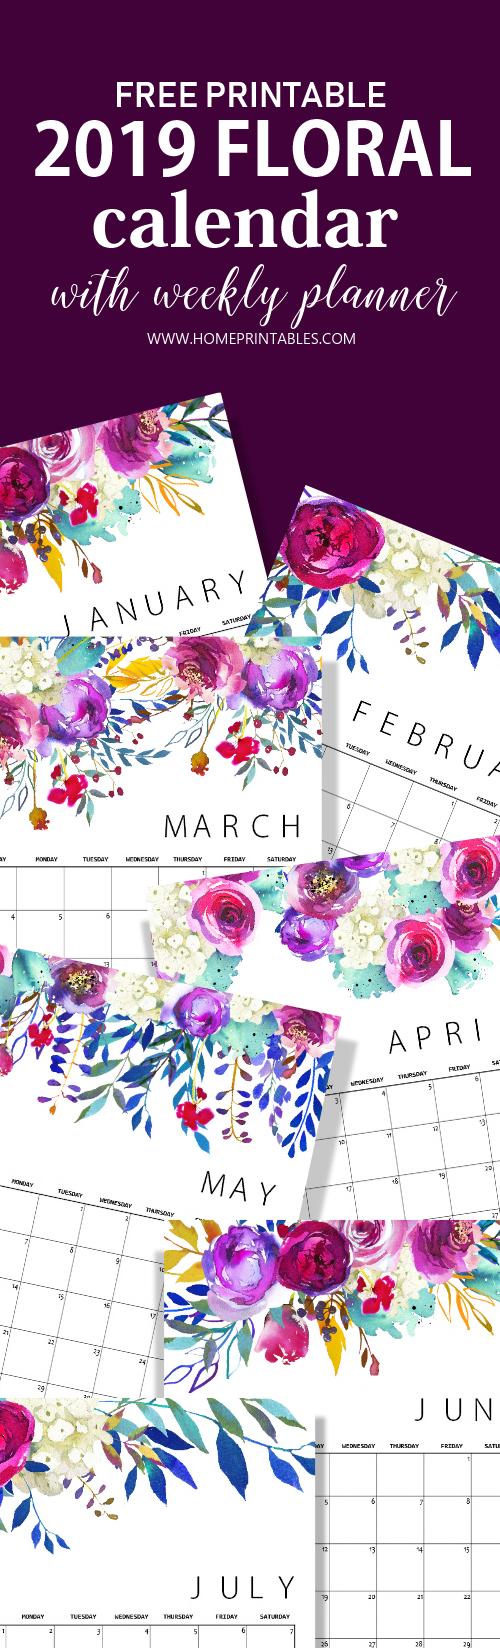 free calendar 2019 printable